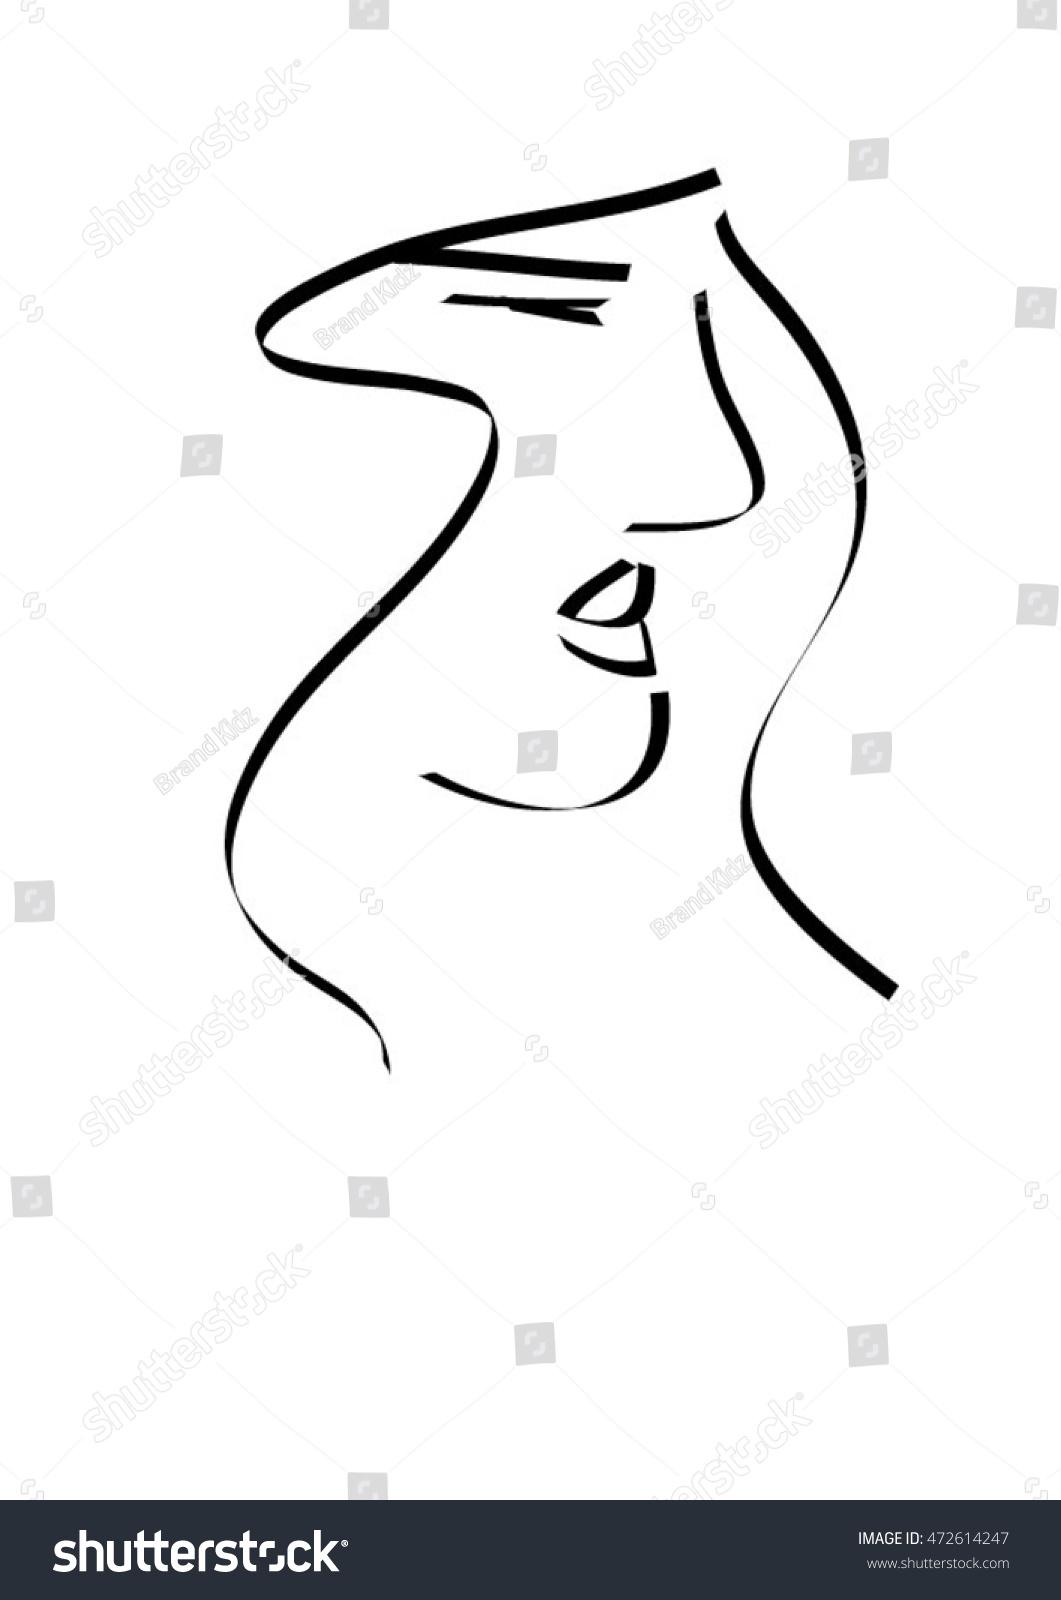 Naked Pregnant Women Stock S Illustrations And Vector Art  Hot Girl Hd Wallpaper-1464